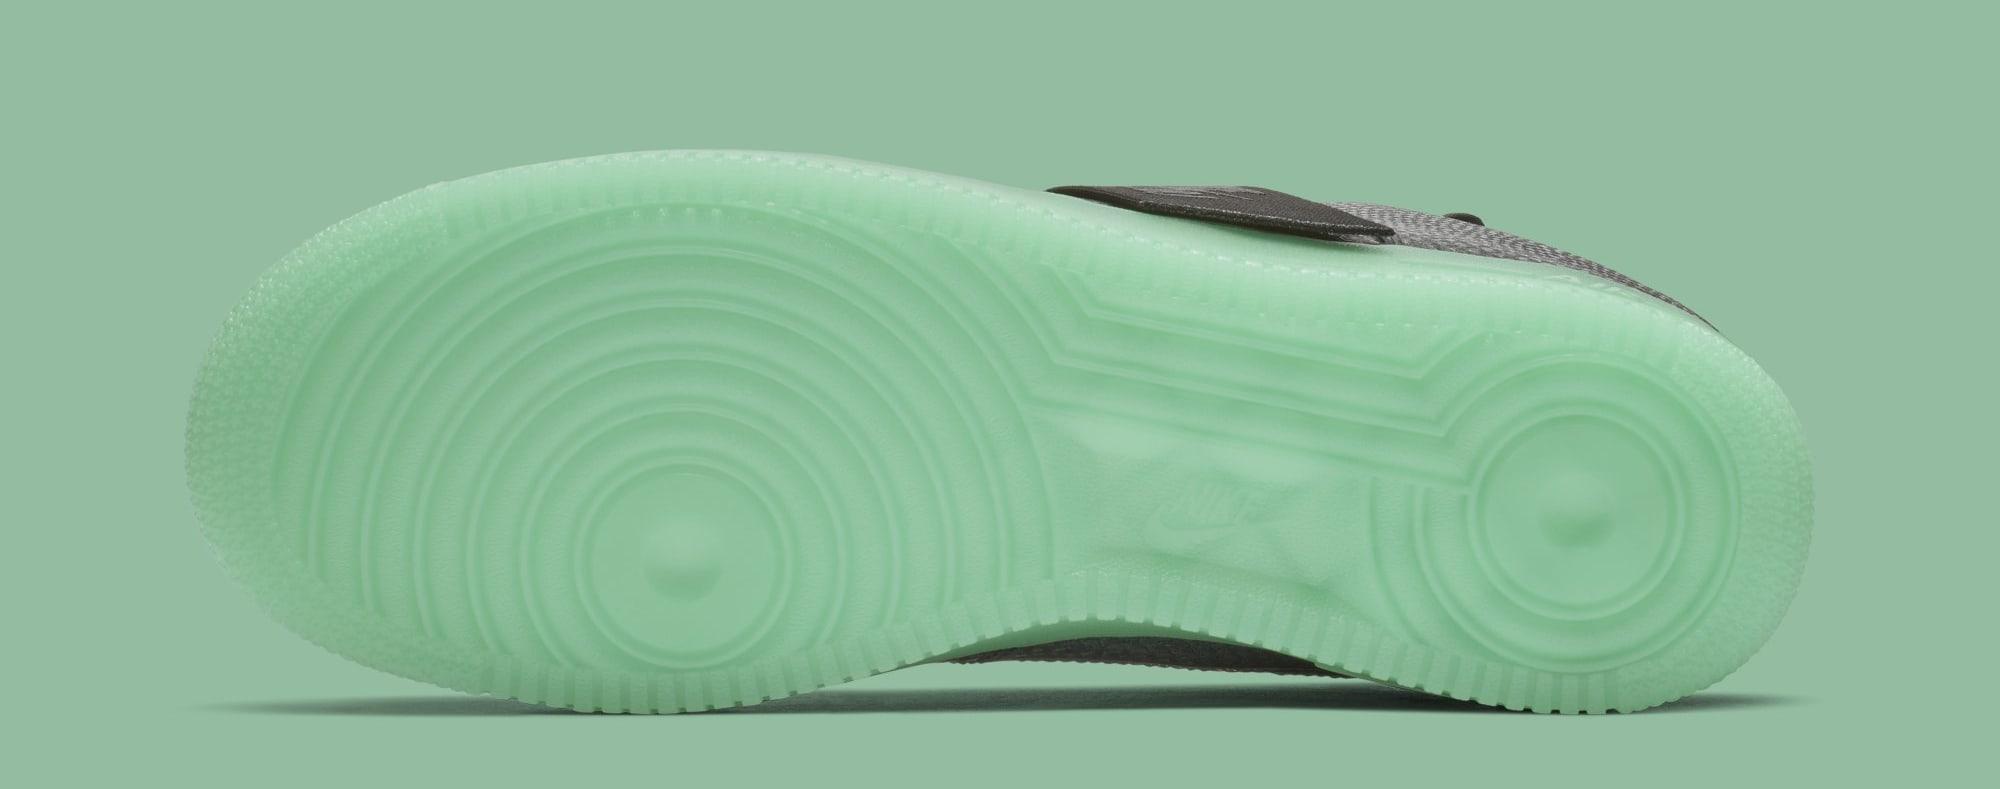 Nike Air 1 'obj' Force 001 DateSole Low Av2040 Release Utility DIE29H